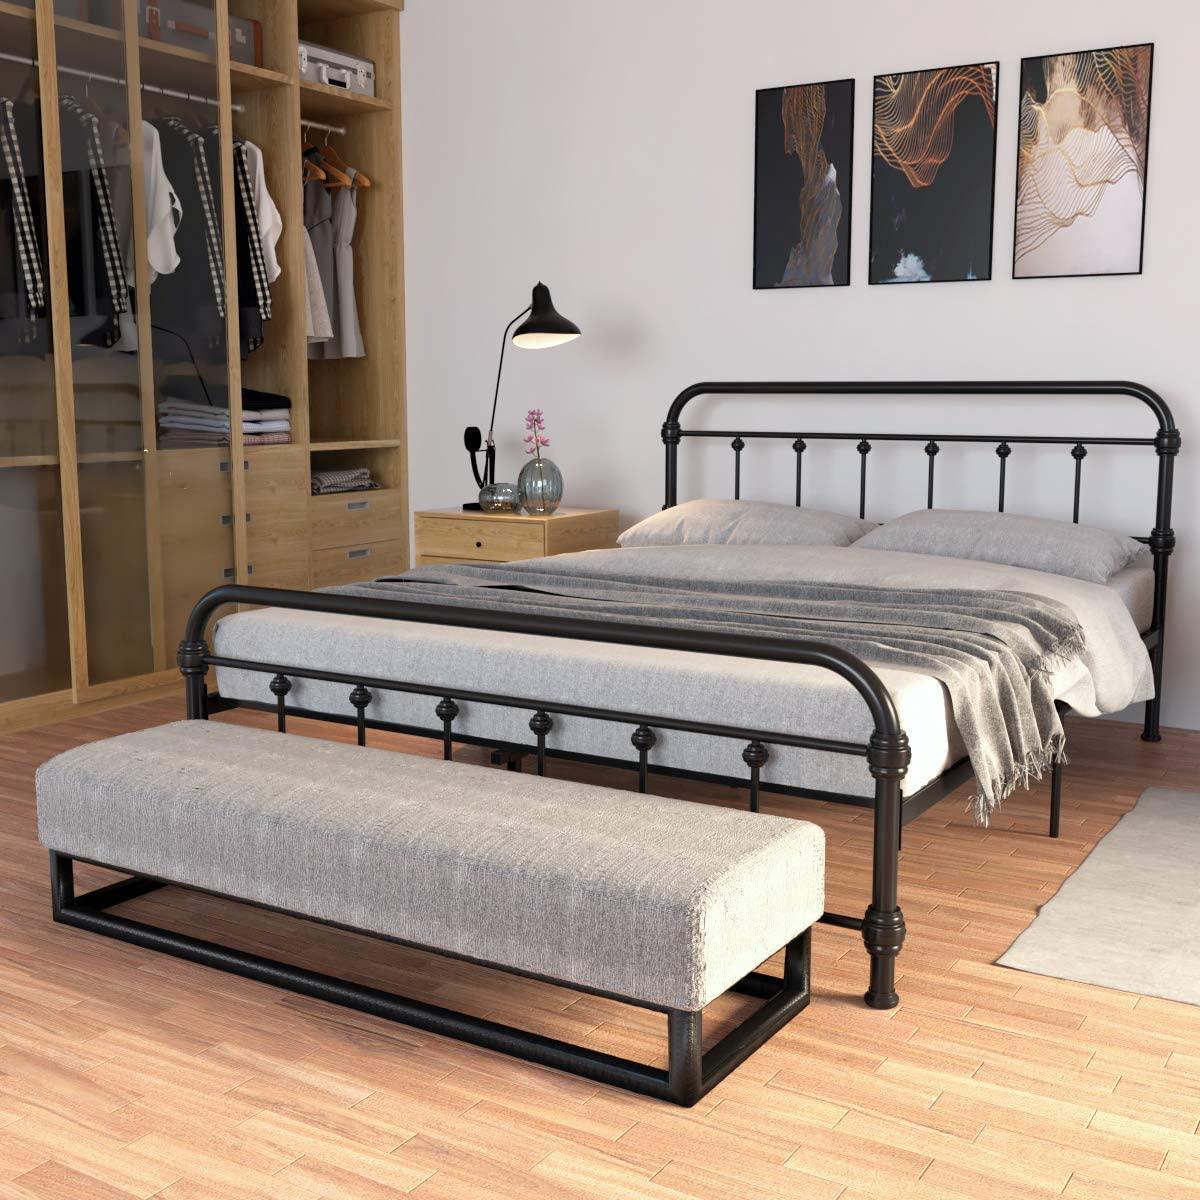 JAXPETY Queen Size Bedroom Metal Platform, Bed Frame with Wood Slats Mattress, Foundation w/Vintage Headboard, Black